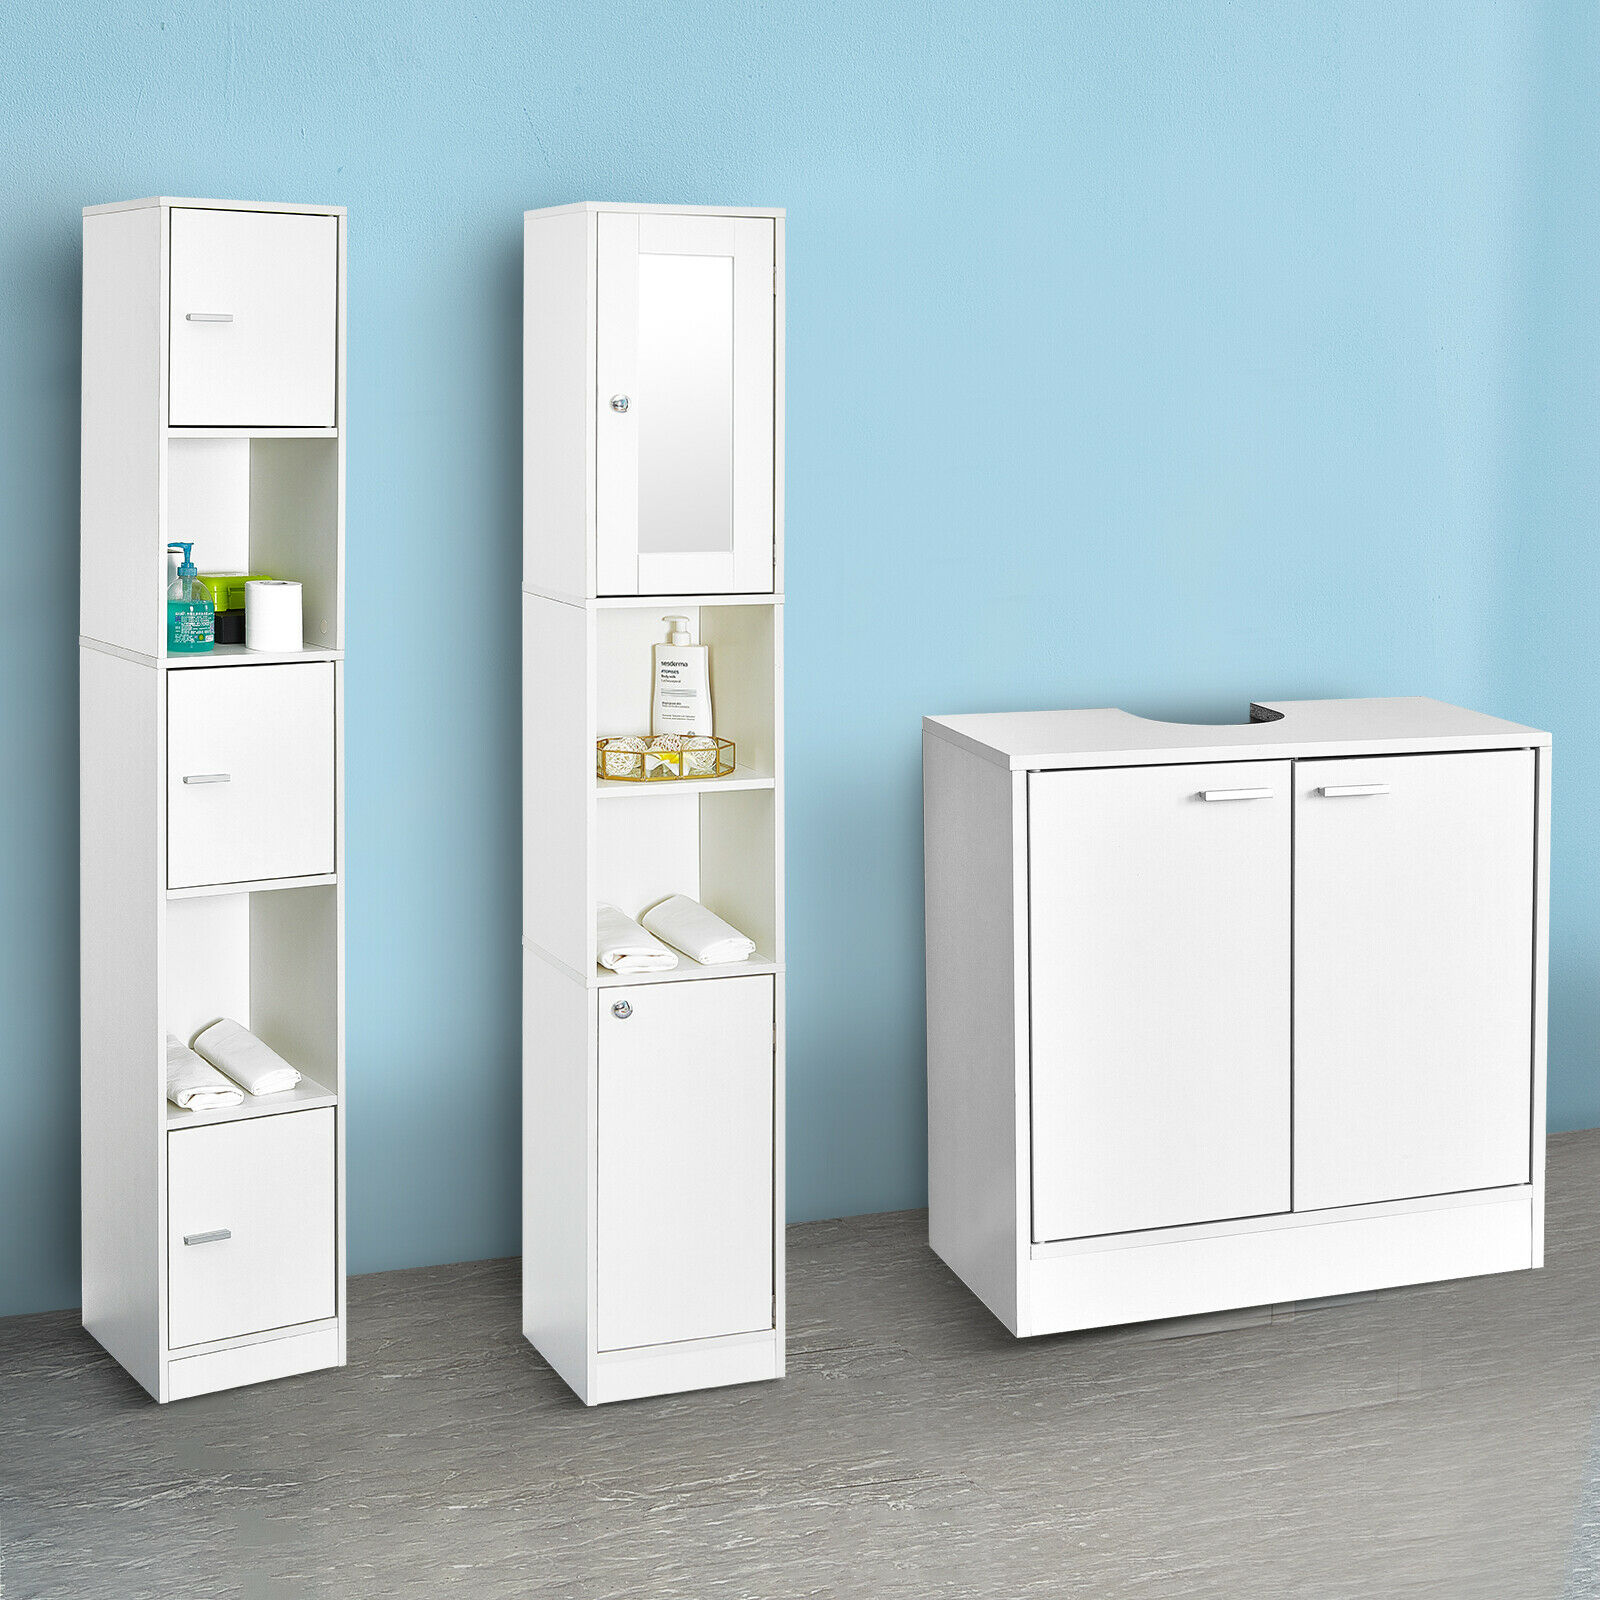 White Cabinet w/ Doors&Shelves Cupboard Storage Unit Bathroom Furniture 3 Styles